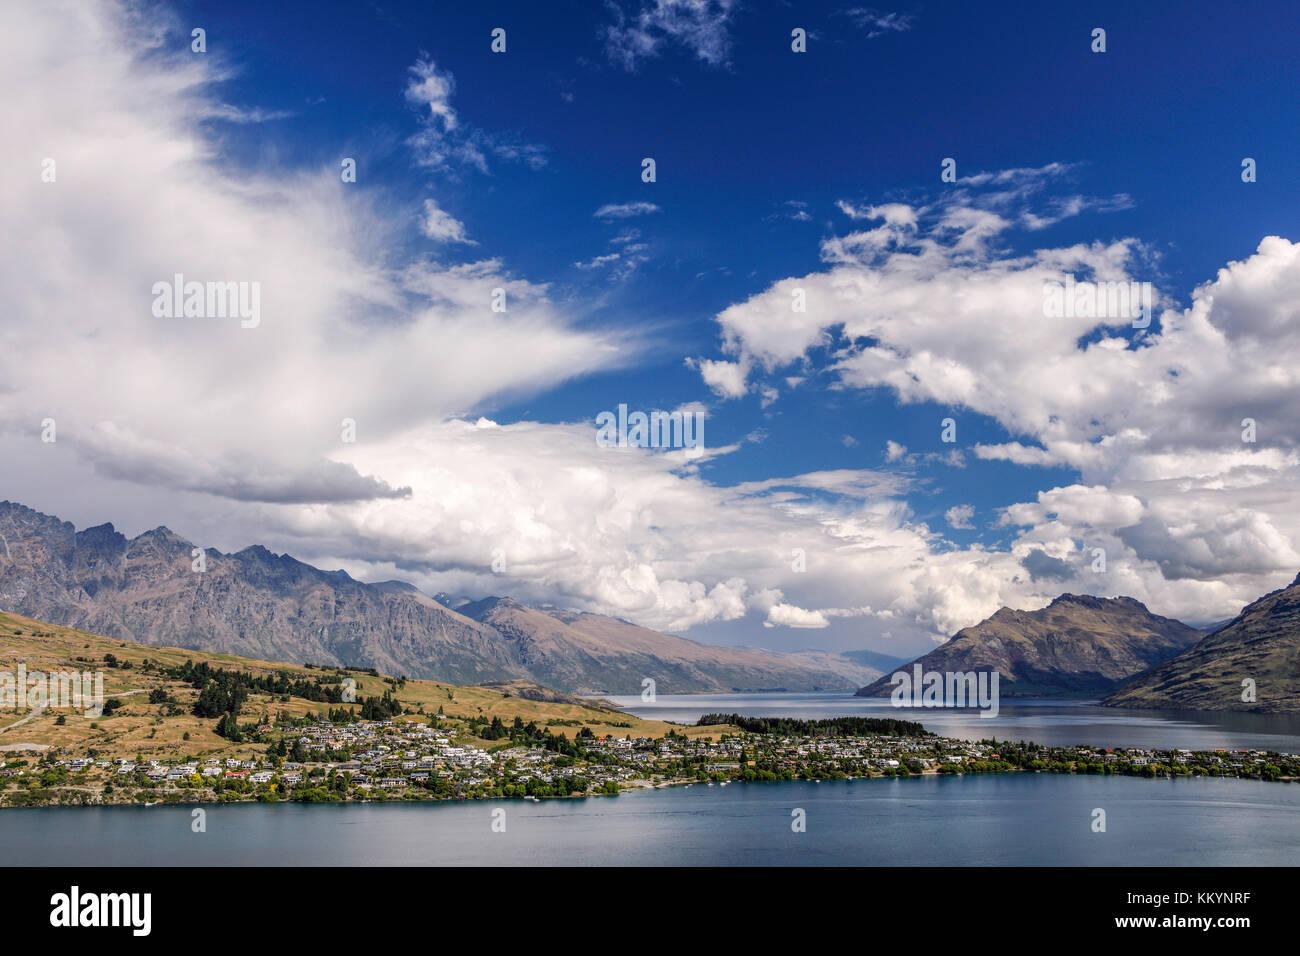 The clouds above Queenstown, Otago Region, New Zealand. Stock Photo